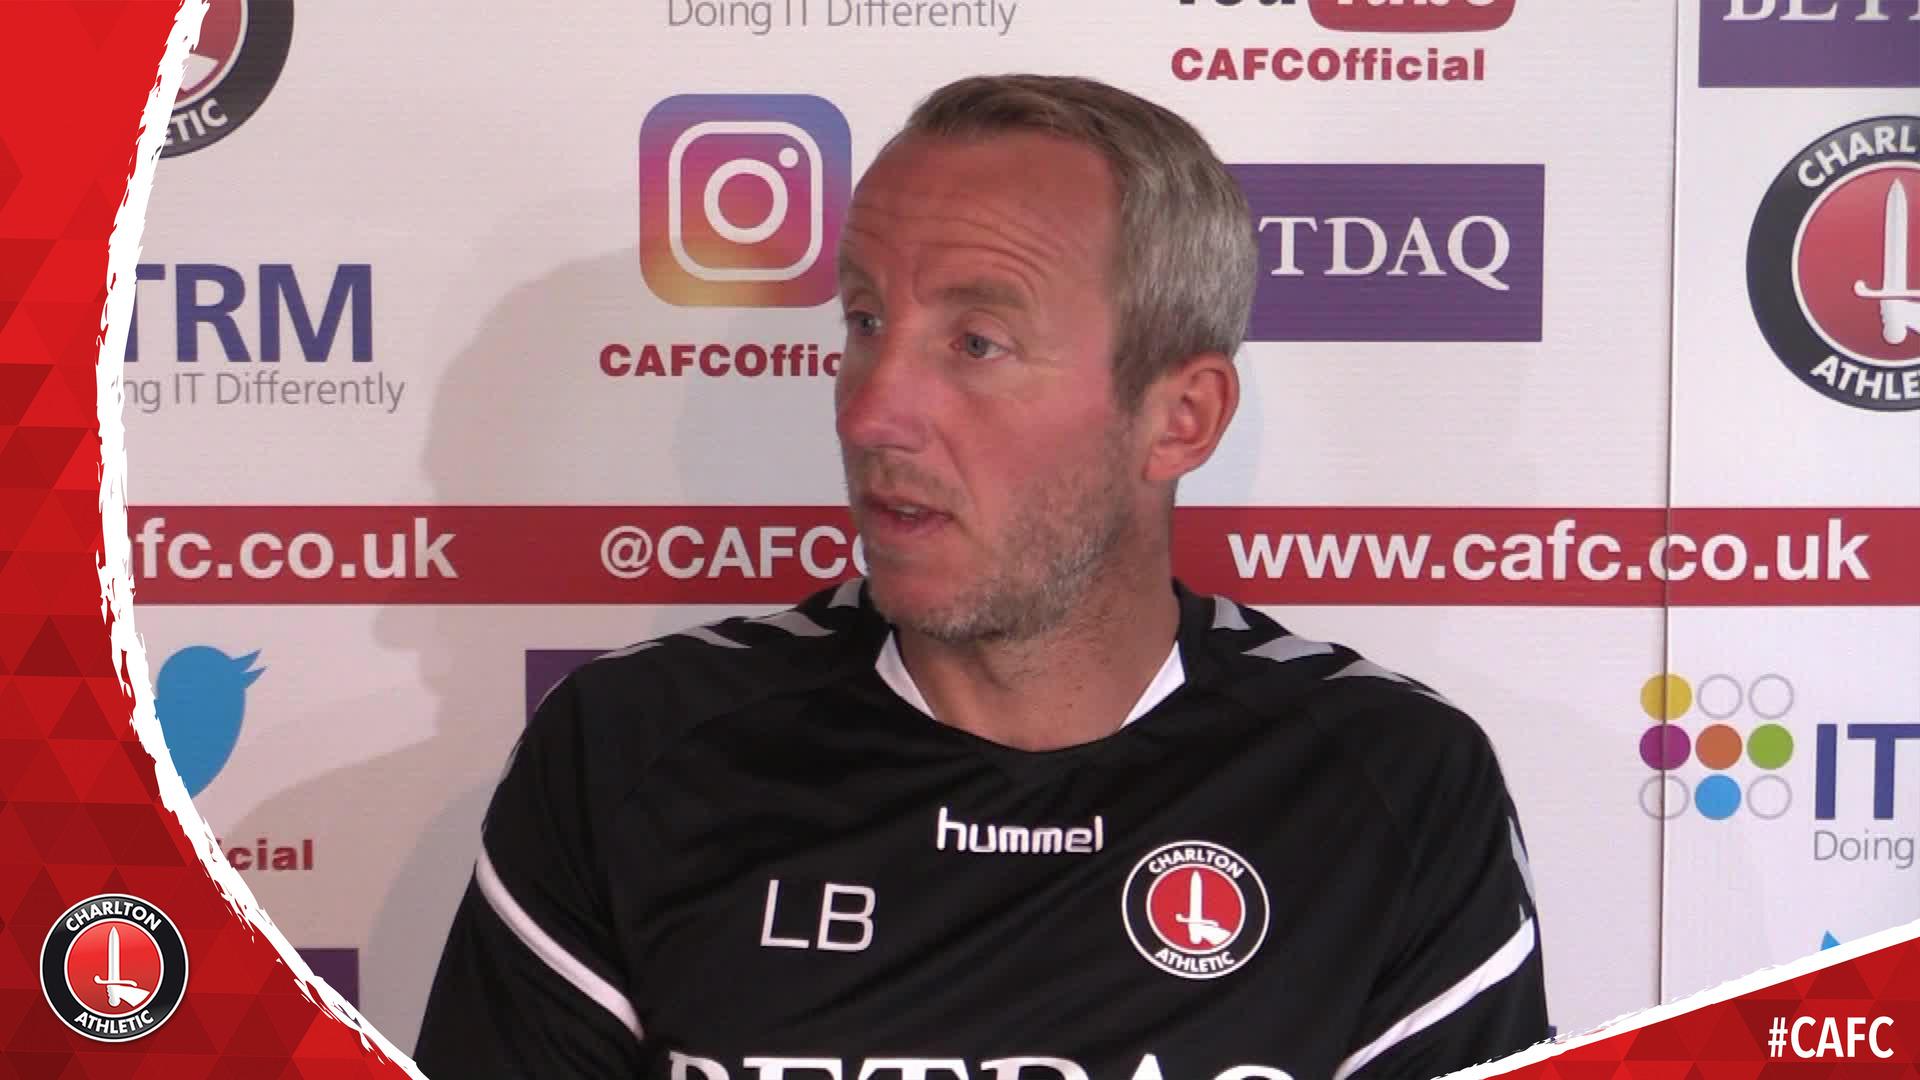 Lee Bowyer looks ahead to Sunderland (a), updates on Anfernee Dijksteel and talks transfers (Aug 2018)